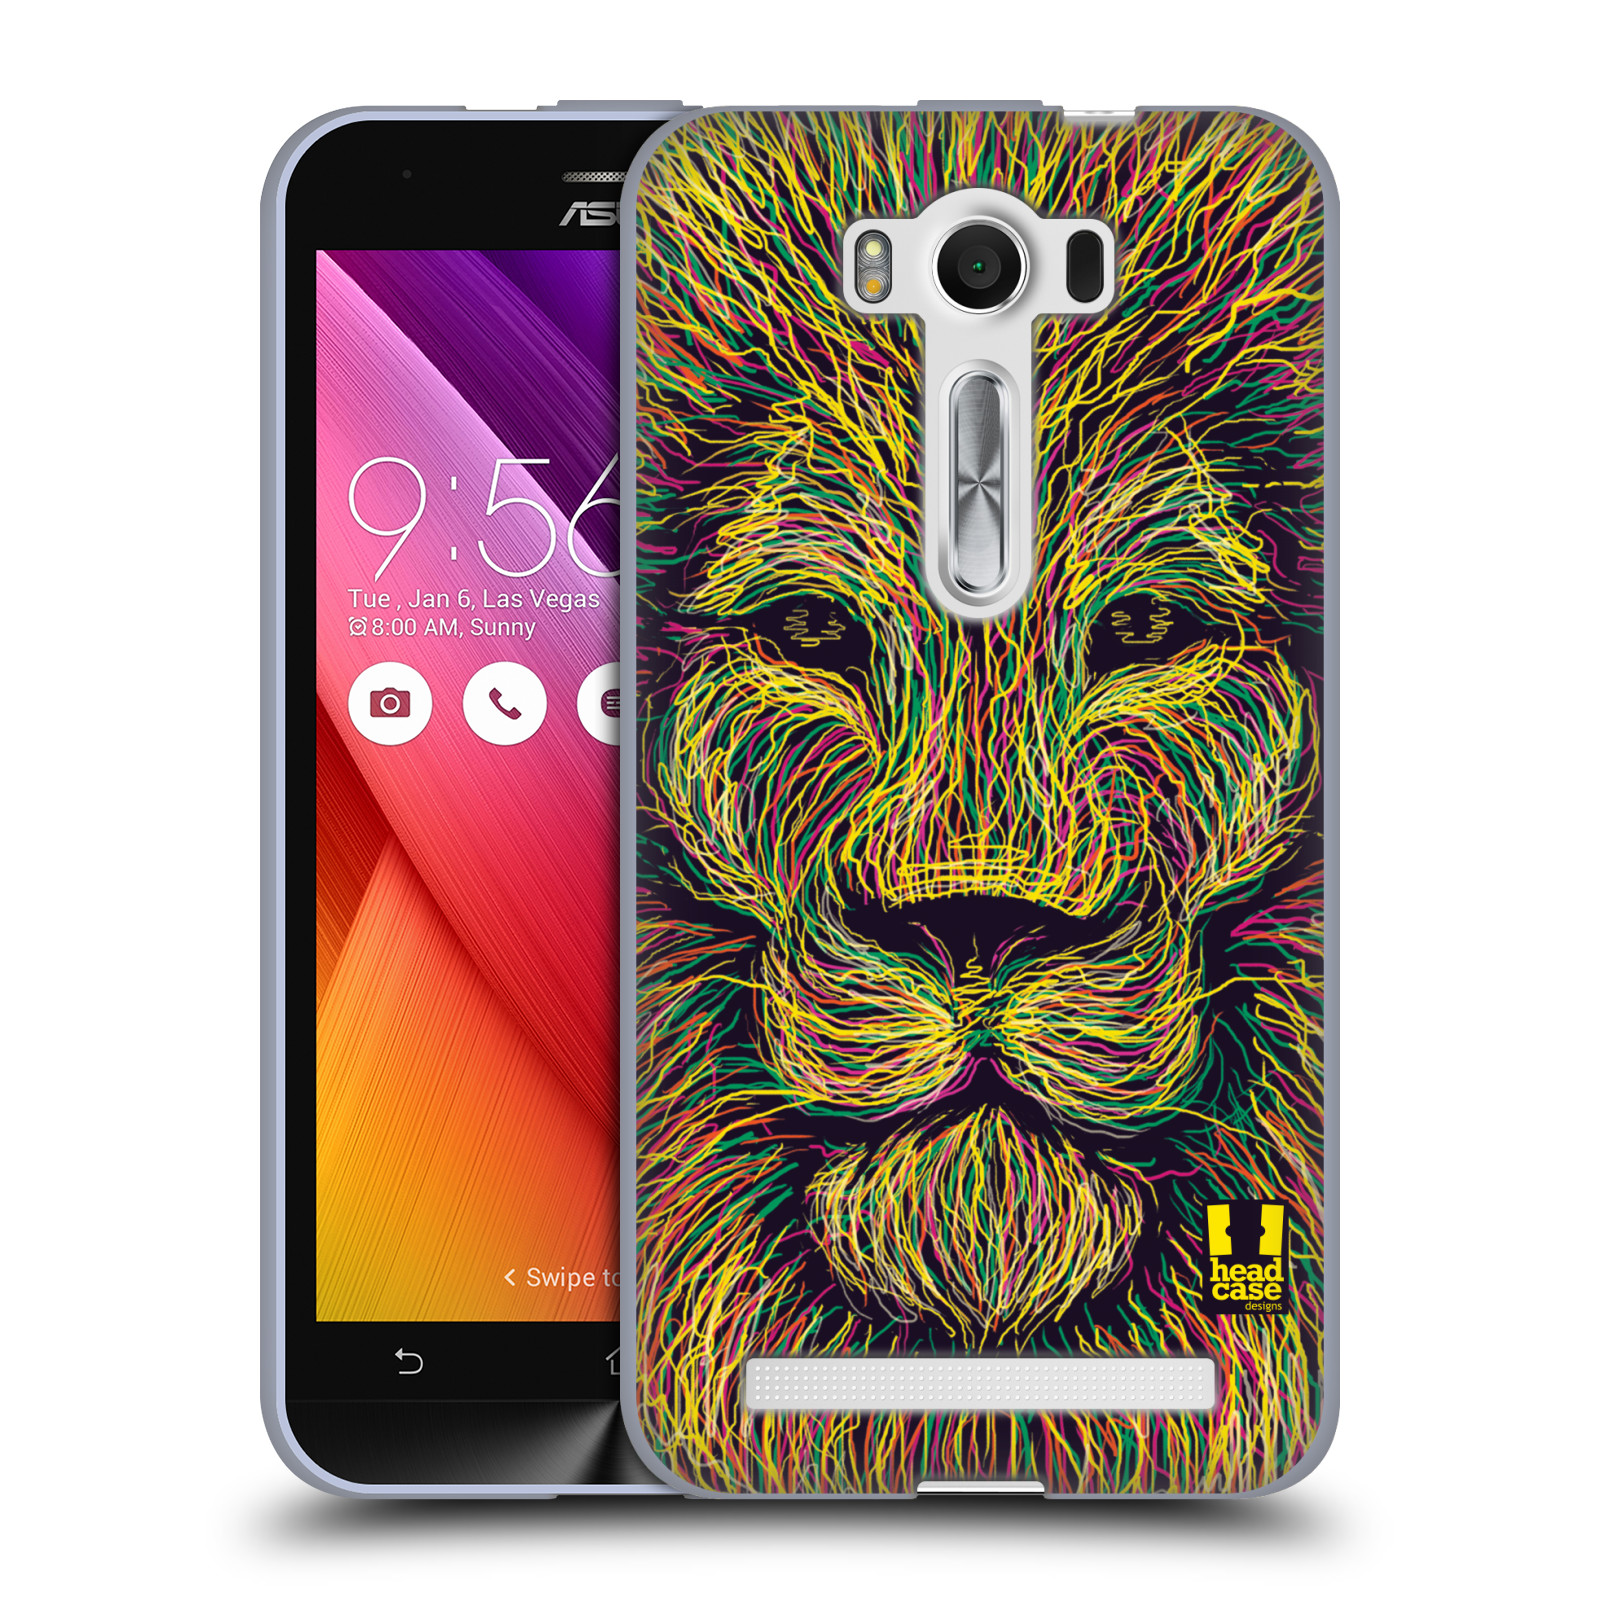 "HEAD CASE silikonový obal na mobil Asus Zenfone 2 LASER (ZE500KL s 5"" displejem) vzor zvíře čmáranice lev"